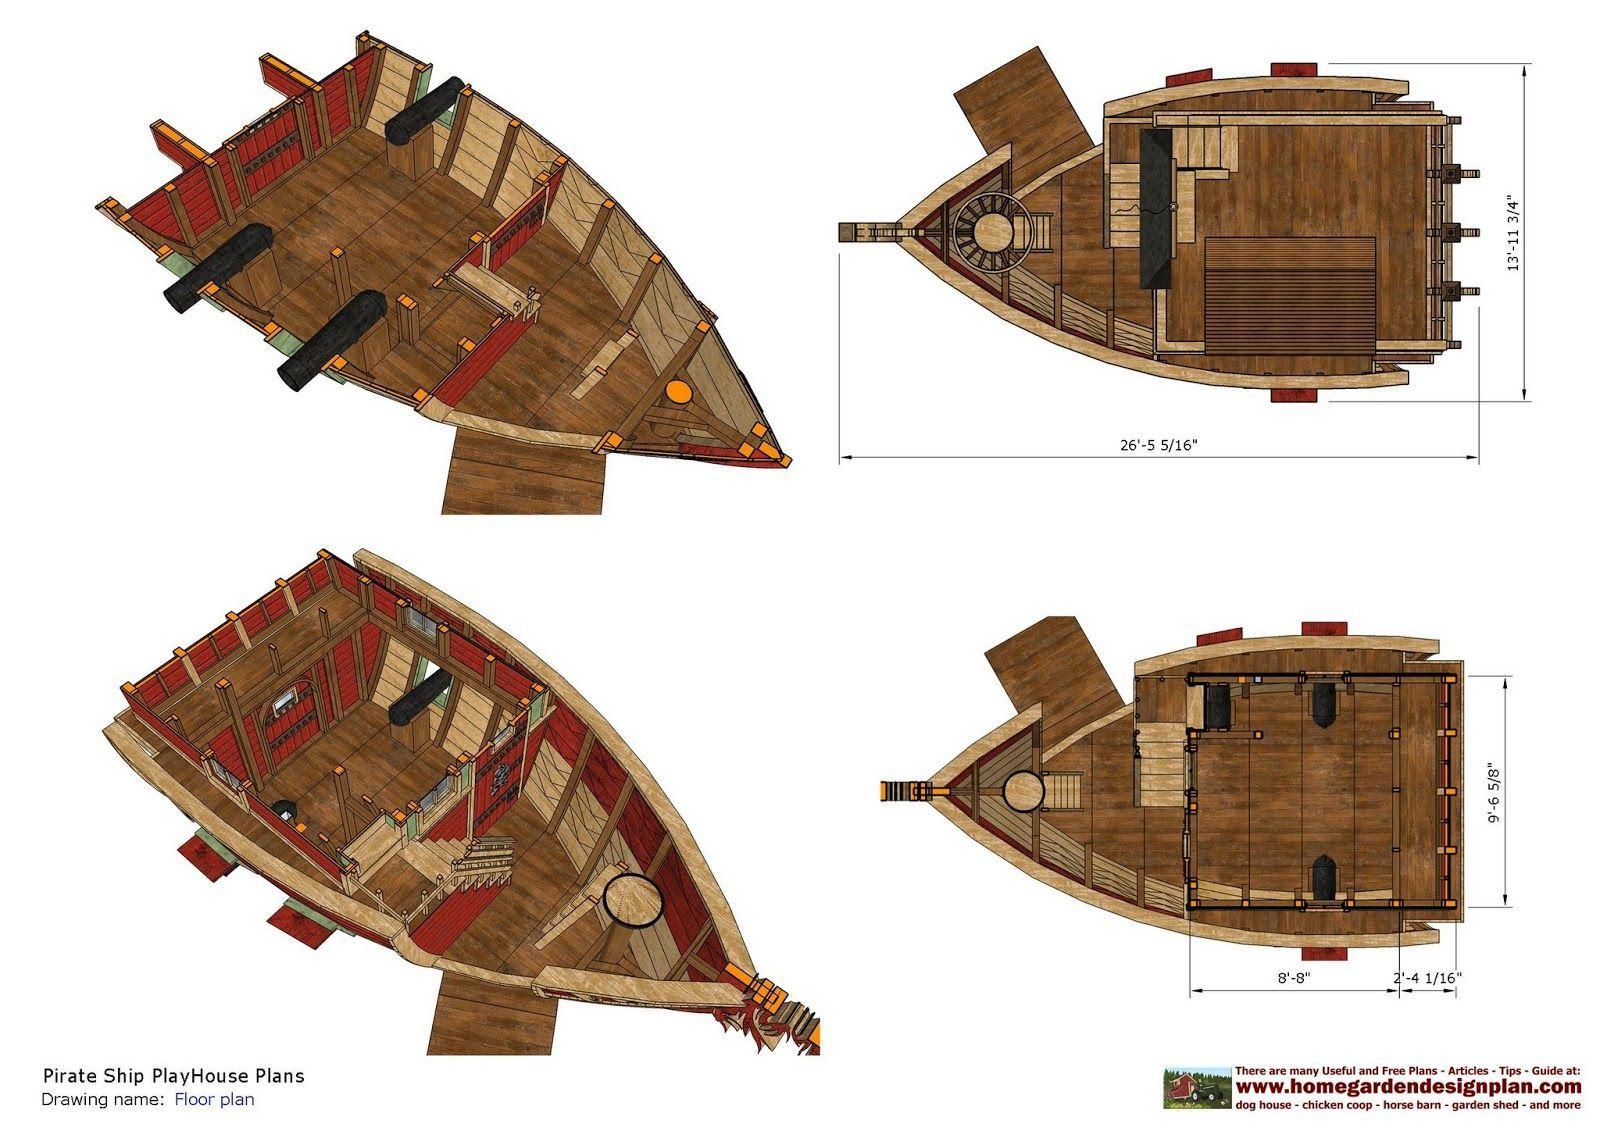 pirate ship construction - Google Search   Pirate ship ...